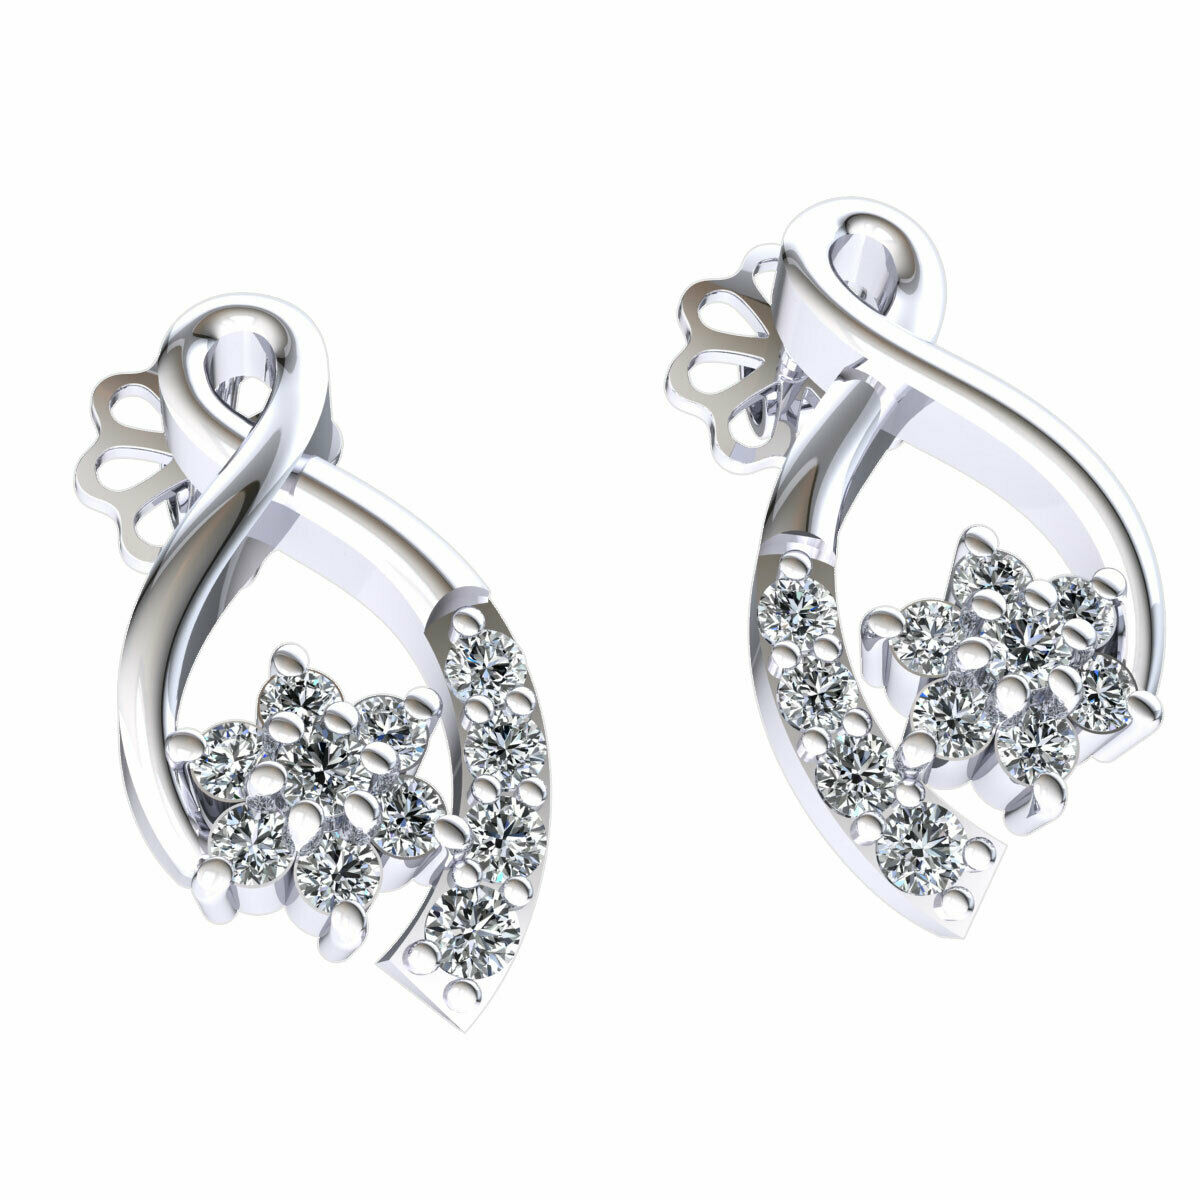 Natural 0.25carat Round Cut Diamond Ladies Ribbon Flower Earrings 18K gold